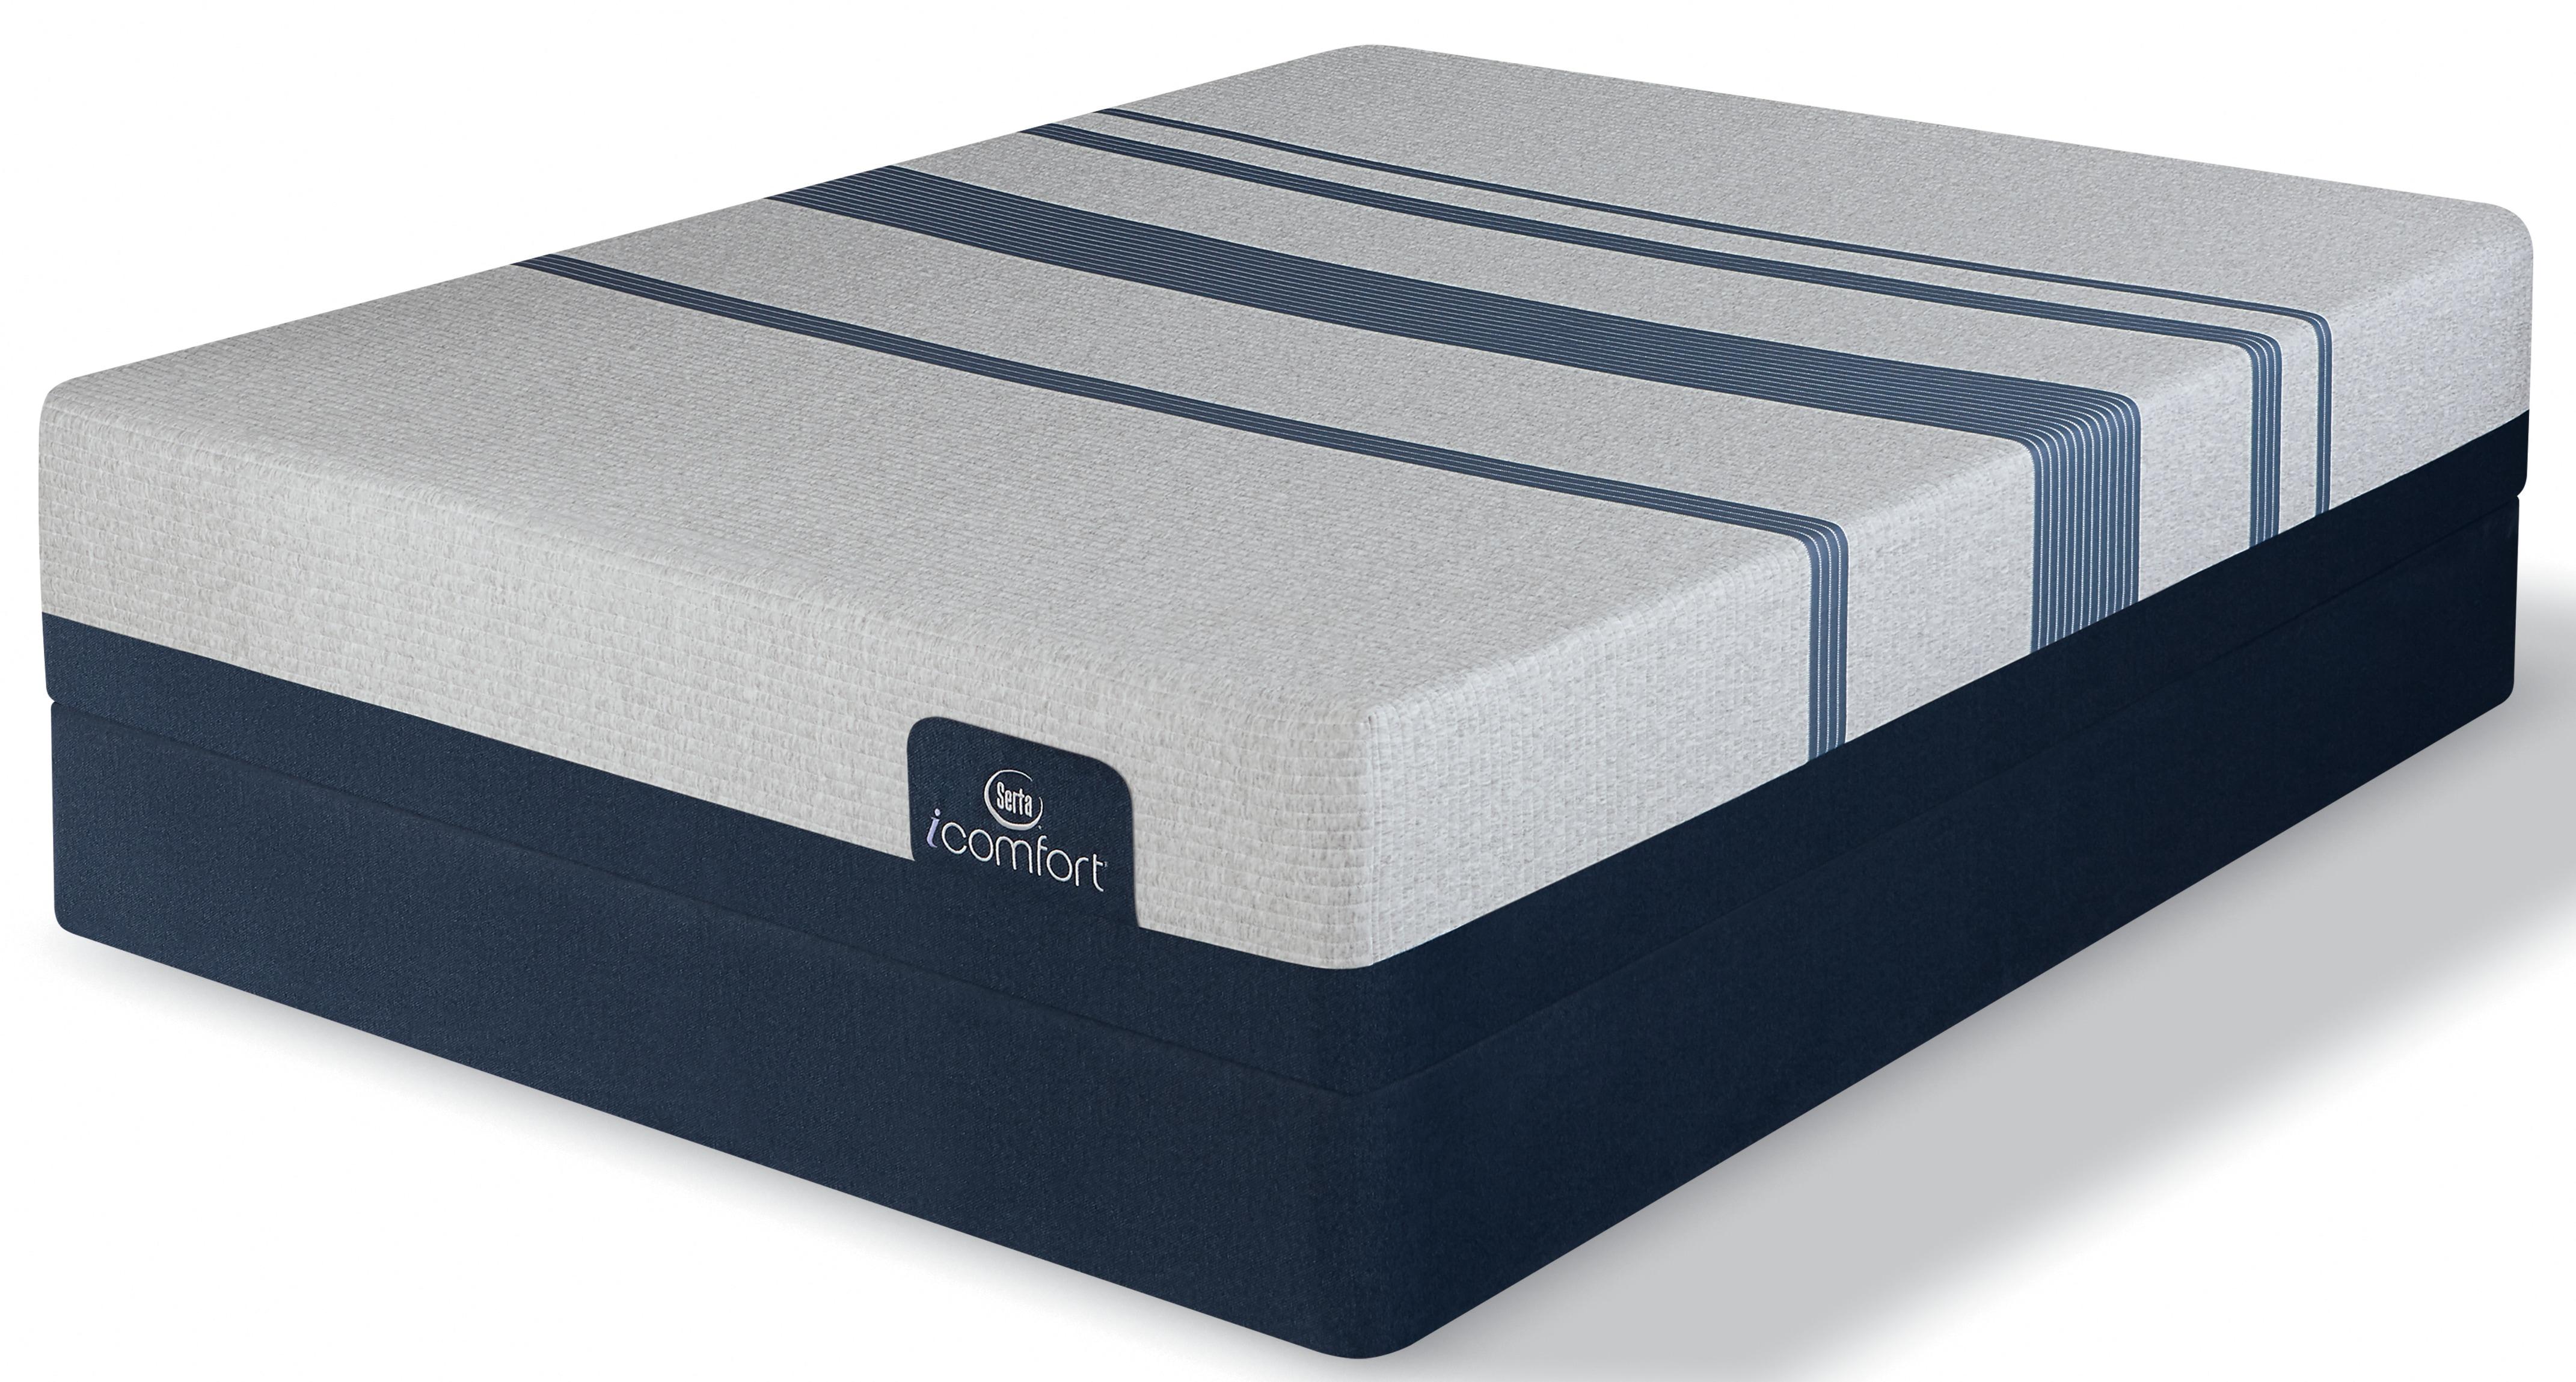 iComfort Blue 500 Full Mattress and Boxspring Set